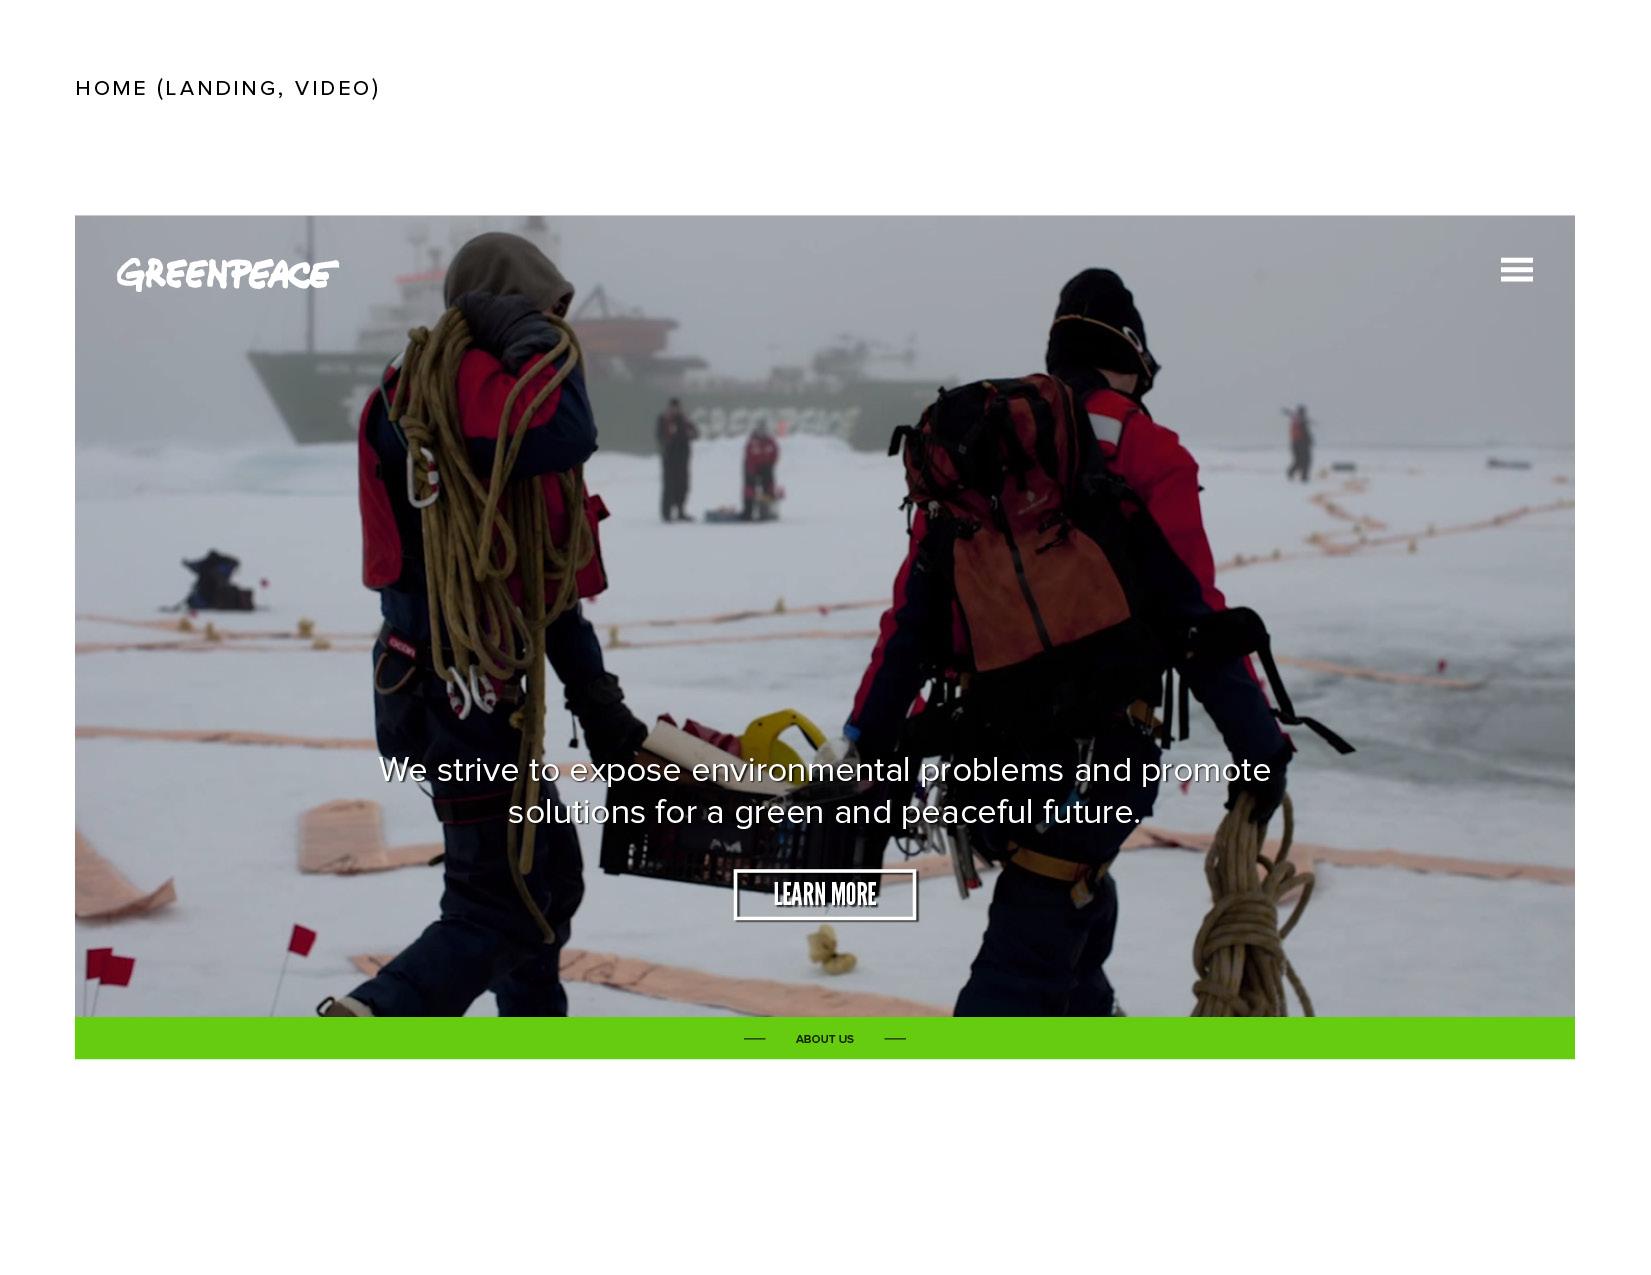 greenpeace2.jpg